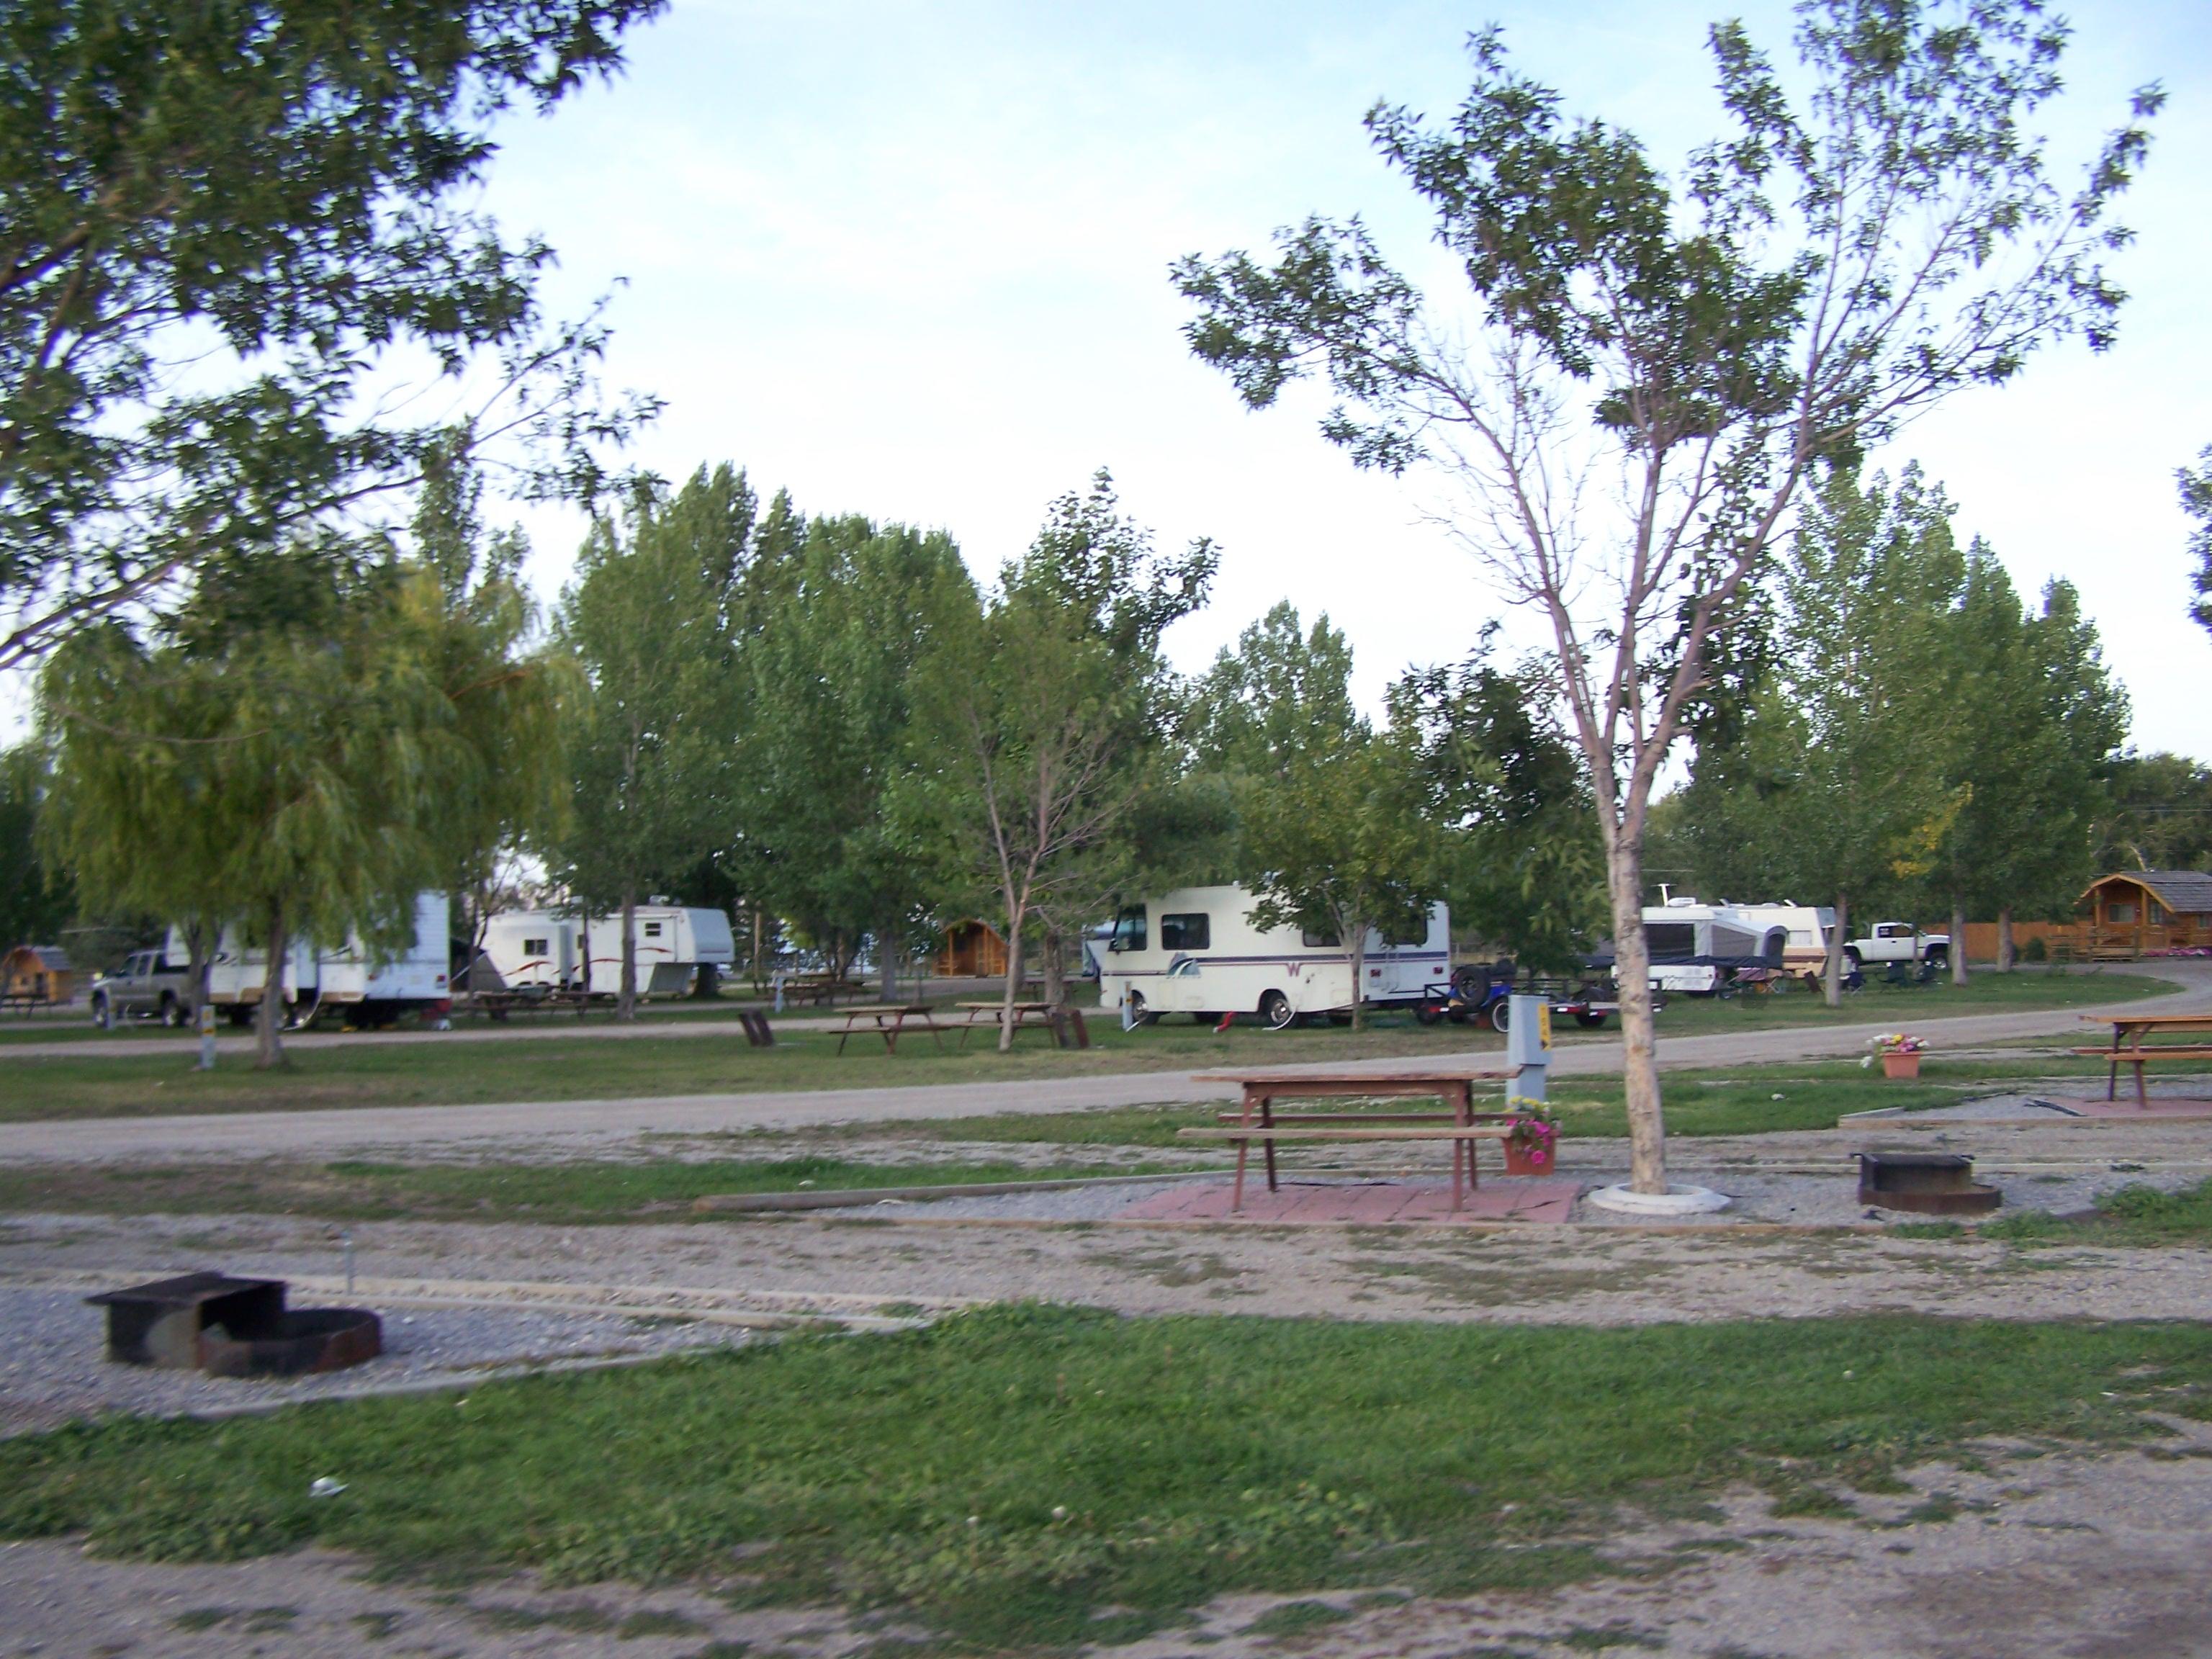 Travel Land Rv Park Garden City Utah - Garden Ideas